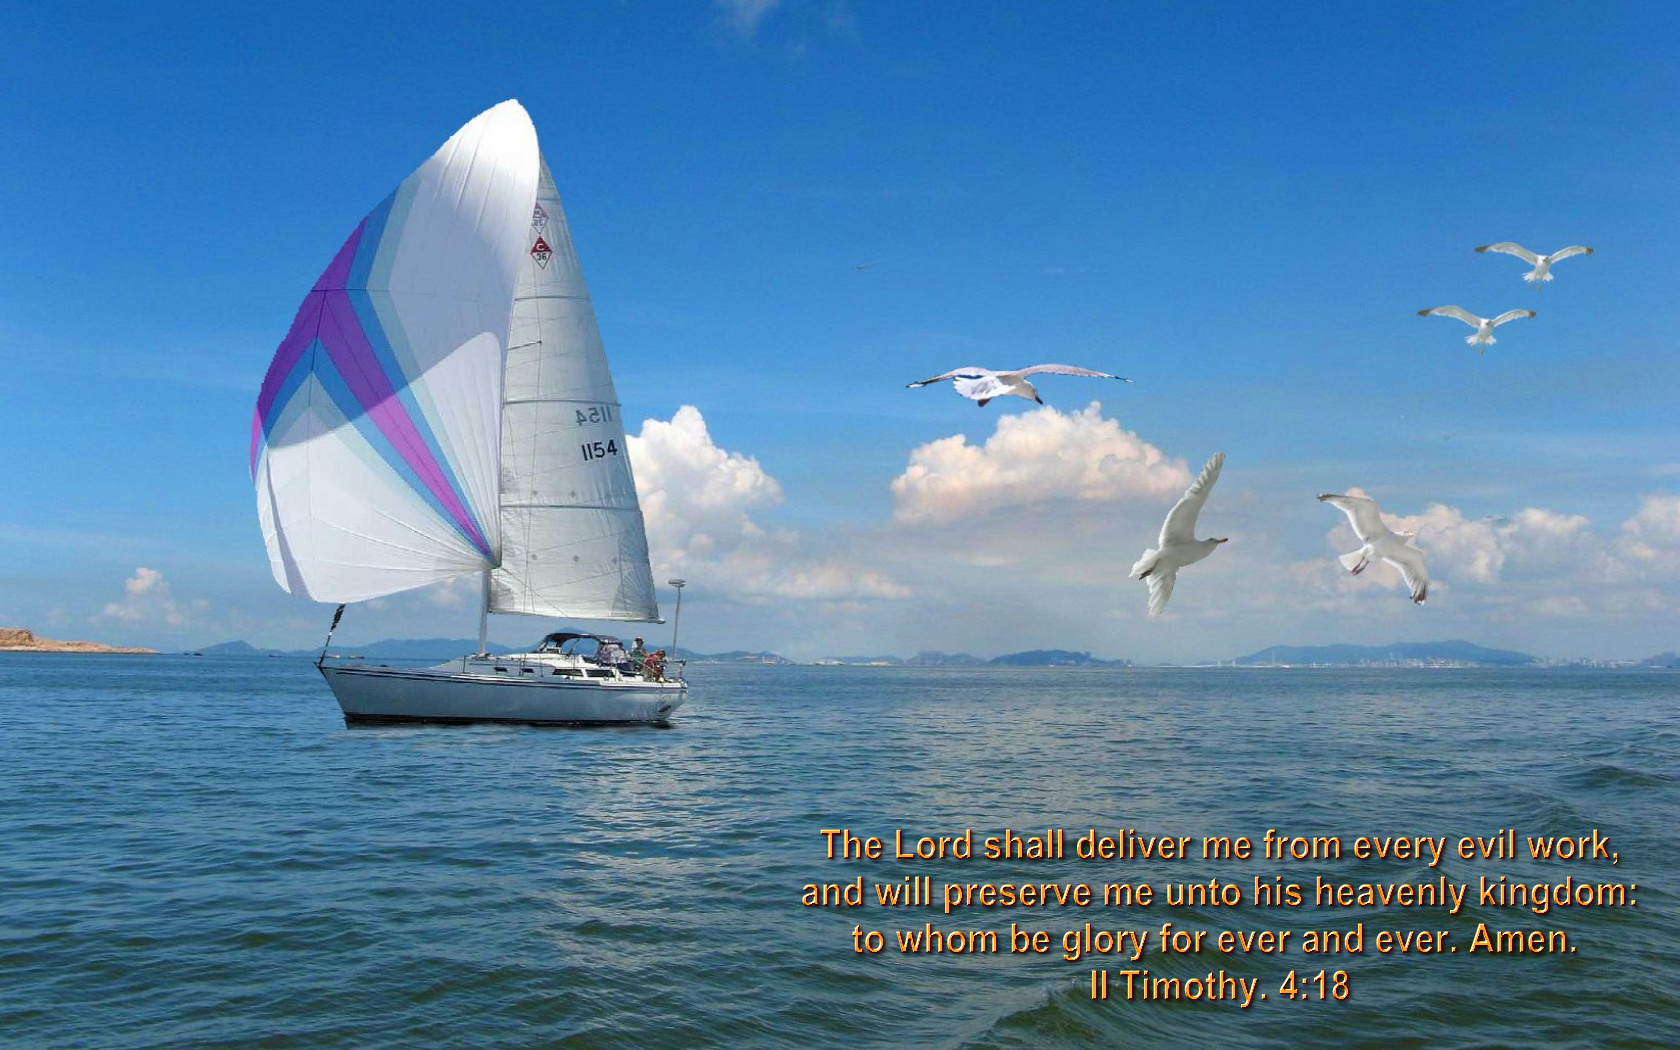 Christian  Bible versed sailing wallpapers 2nd Wittness Weblog 1680x1050